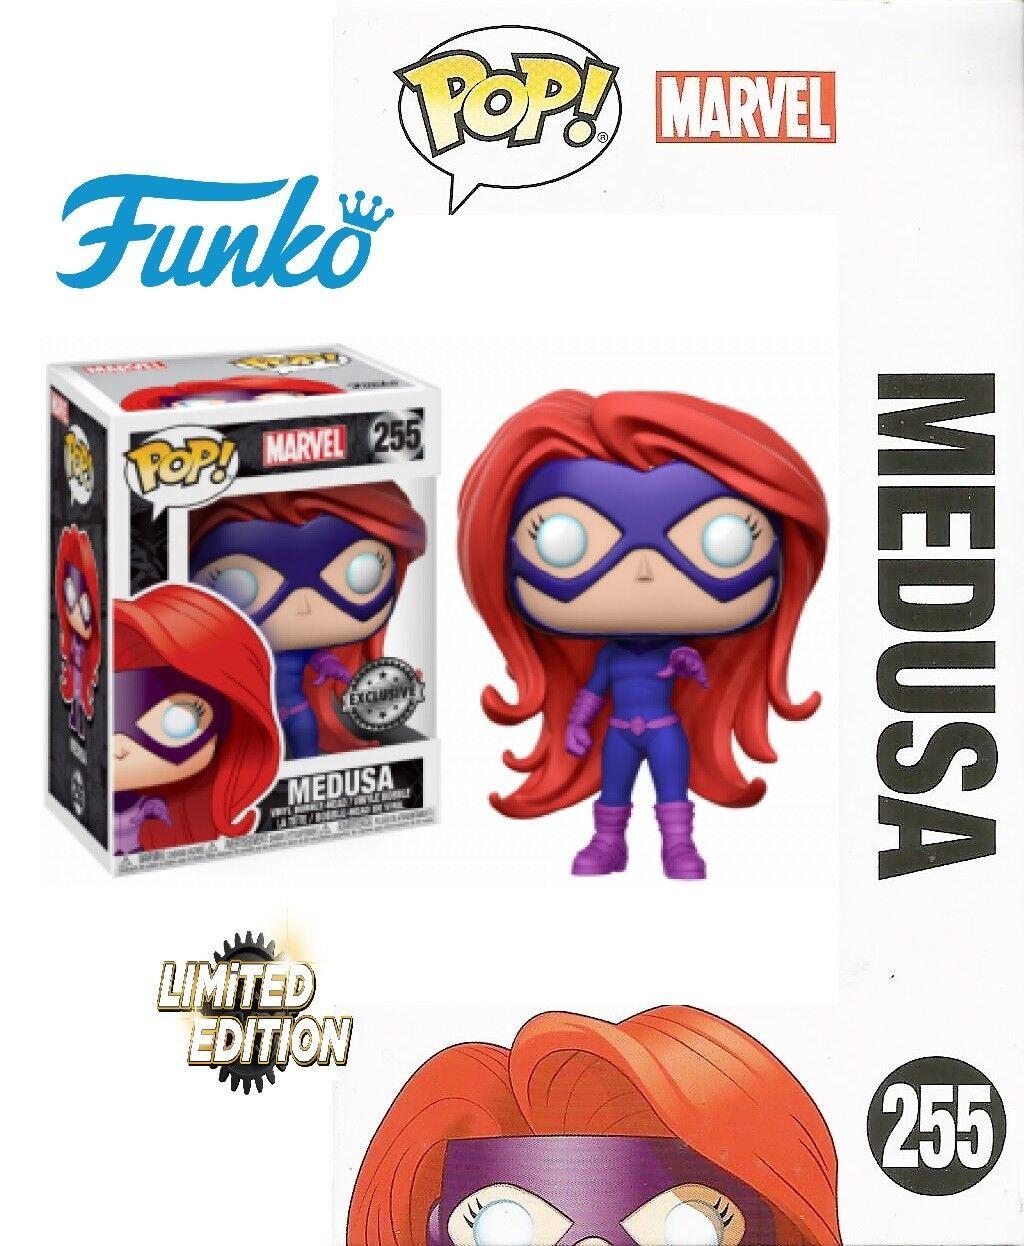 Funko Pop - Marvel - Medusa exclusive - Vinyl Bobble Head Figure NEW   orig.